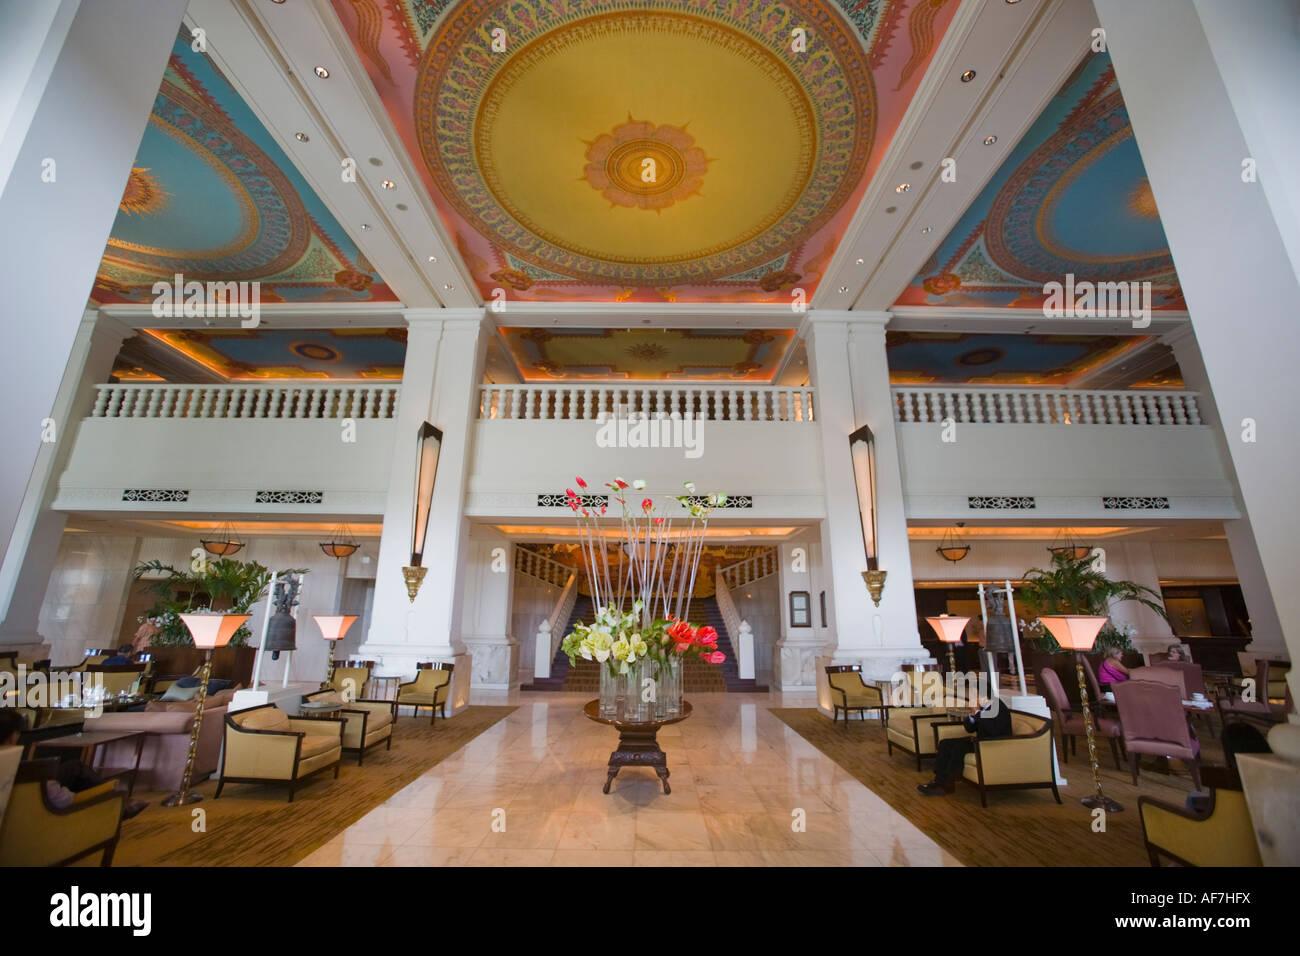 Four Seasons Hotel Lobby Bangkok Thailand no release Stock Photo